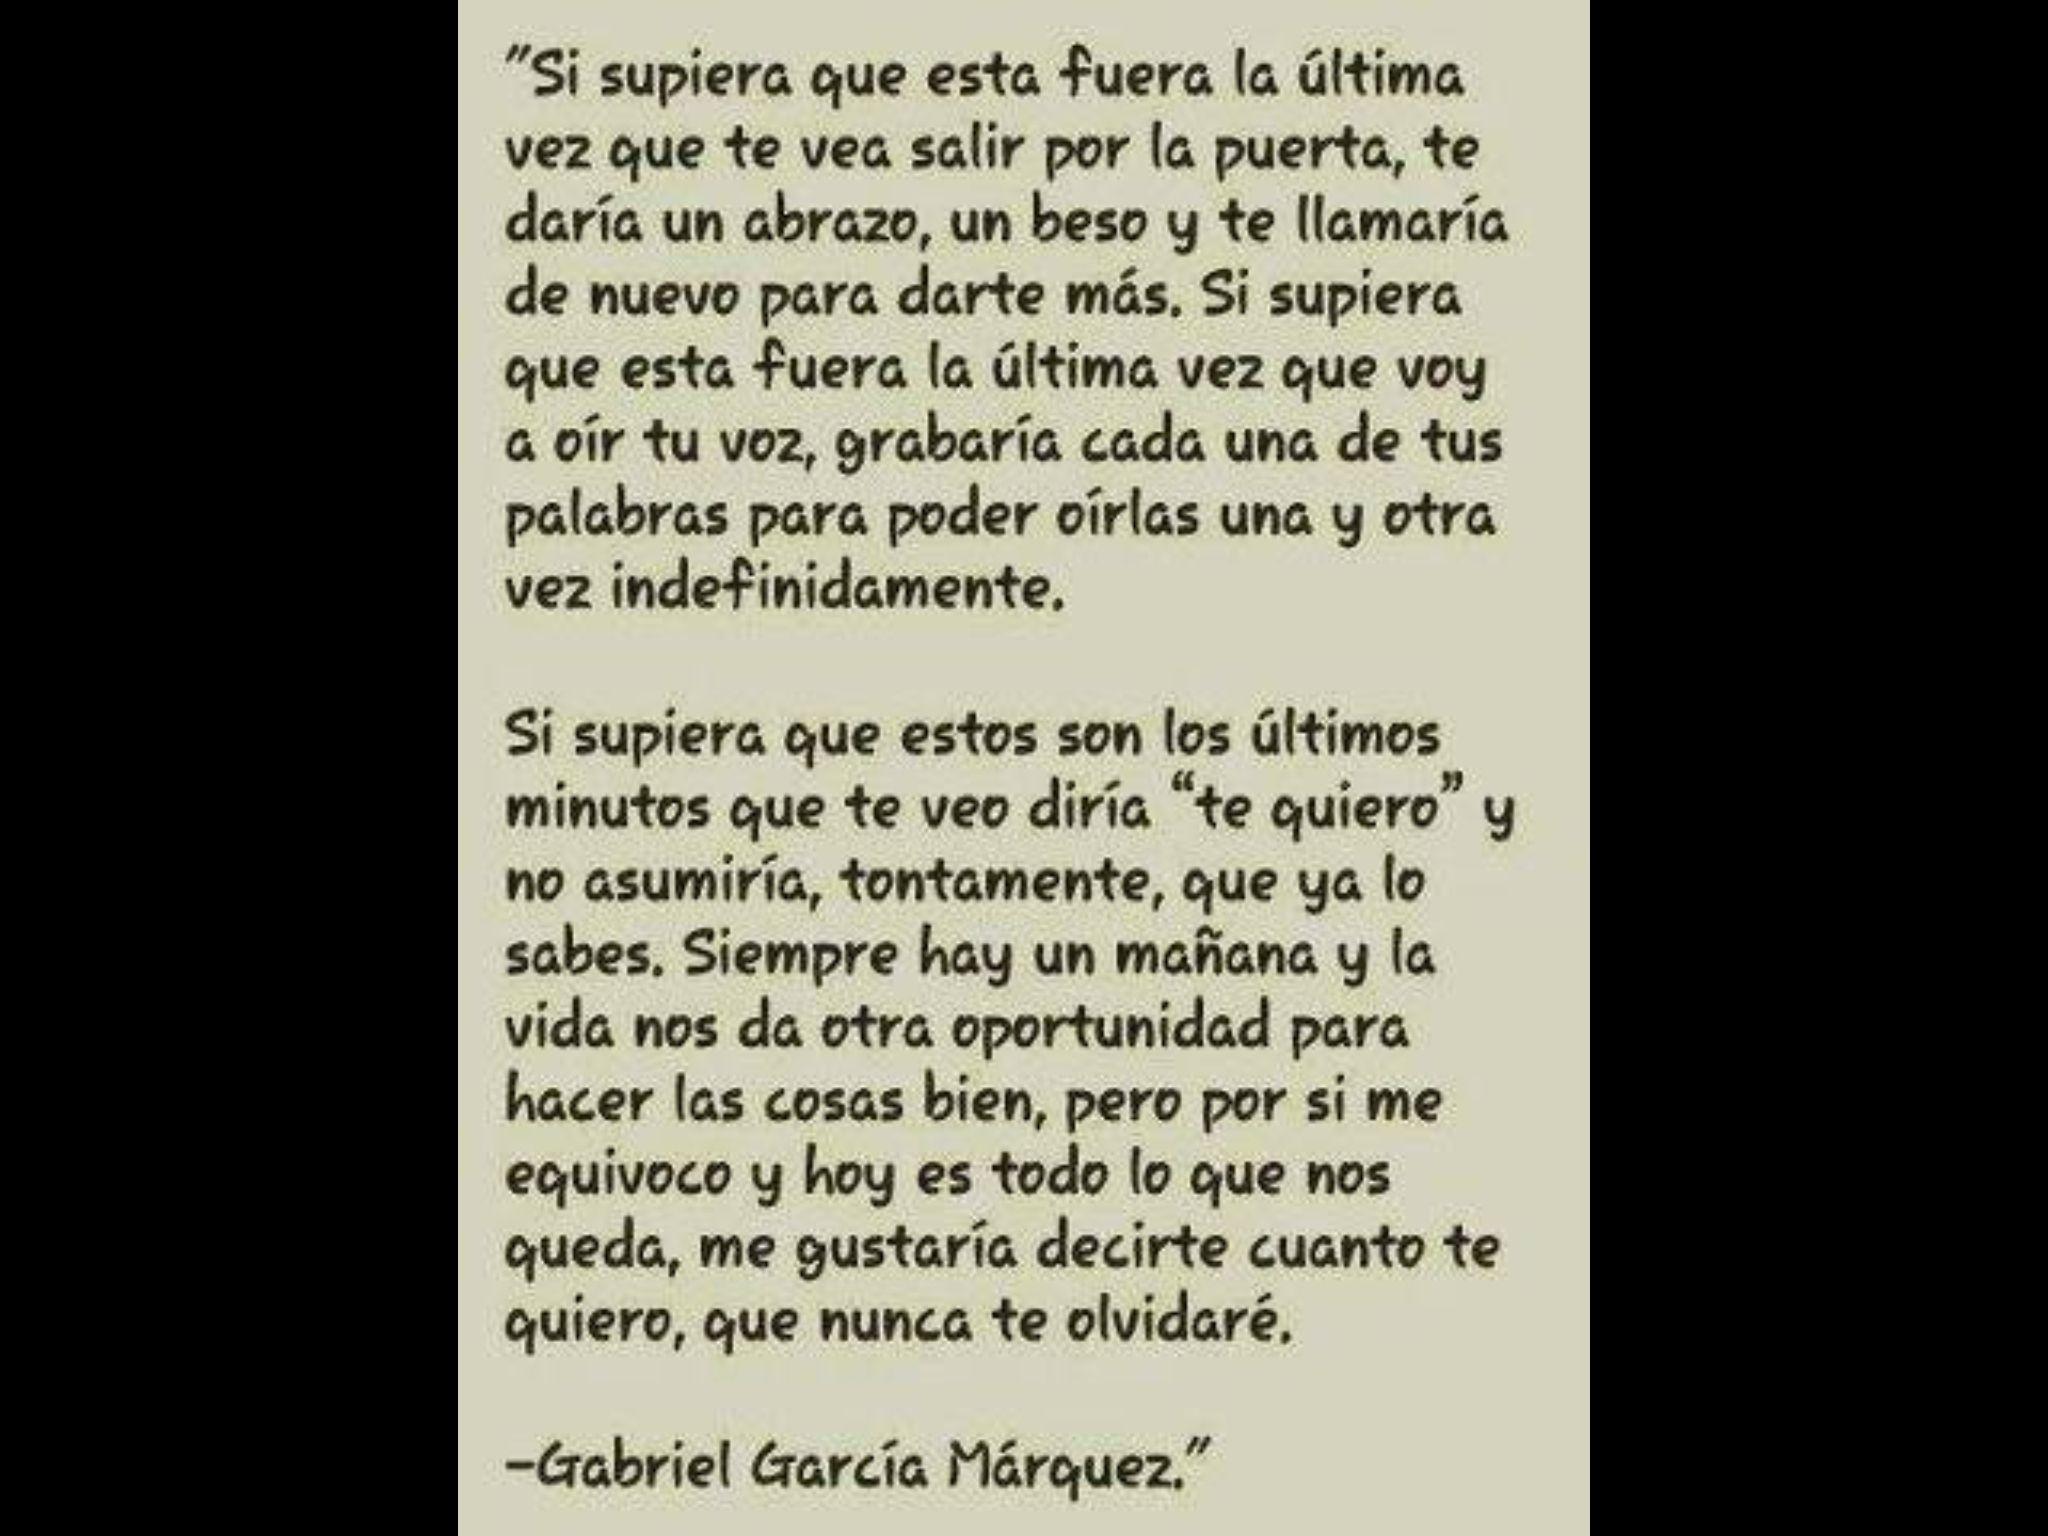 Carta de despedida de Gabriel Garca Márquez GaboFrases De AmorFrase BonitasFrases